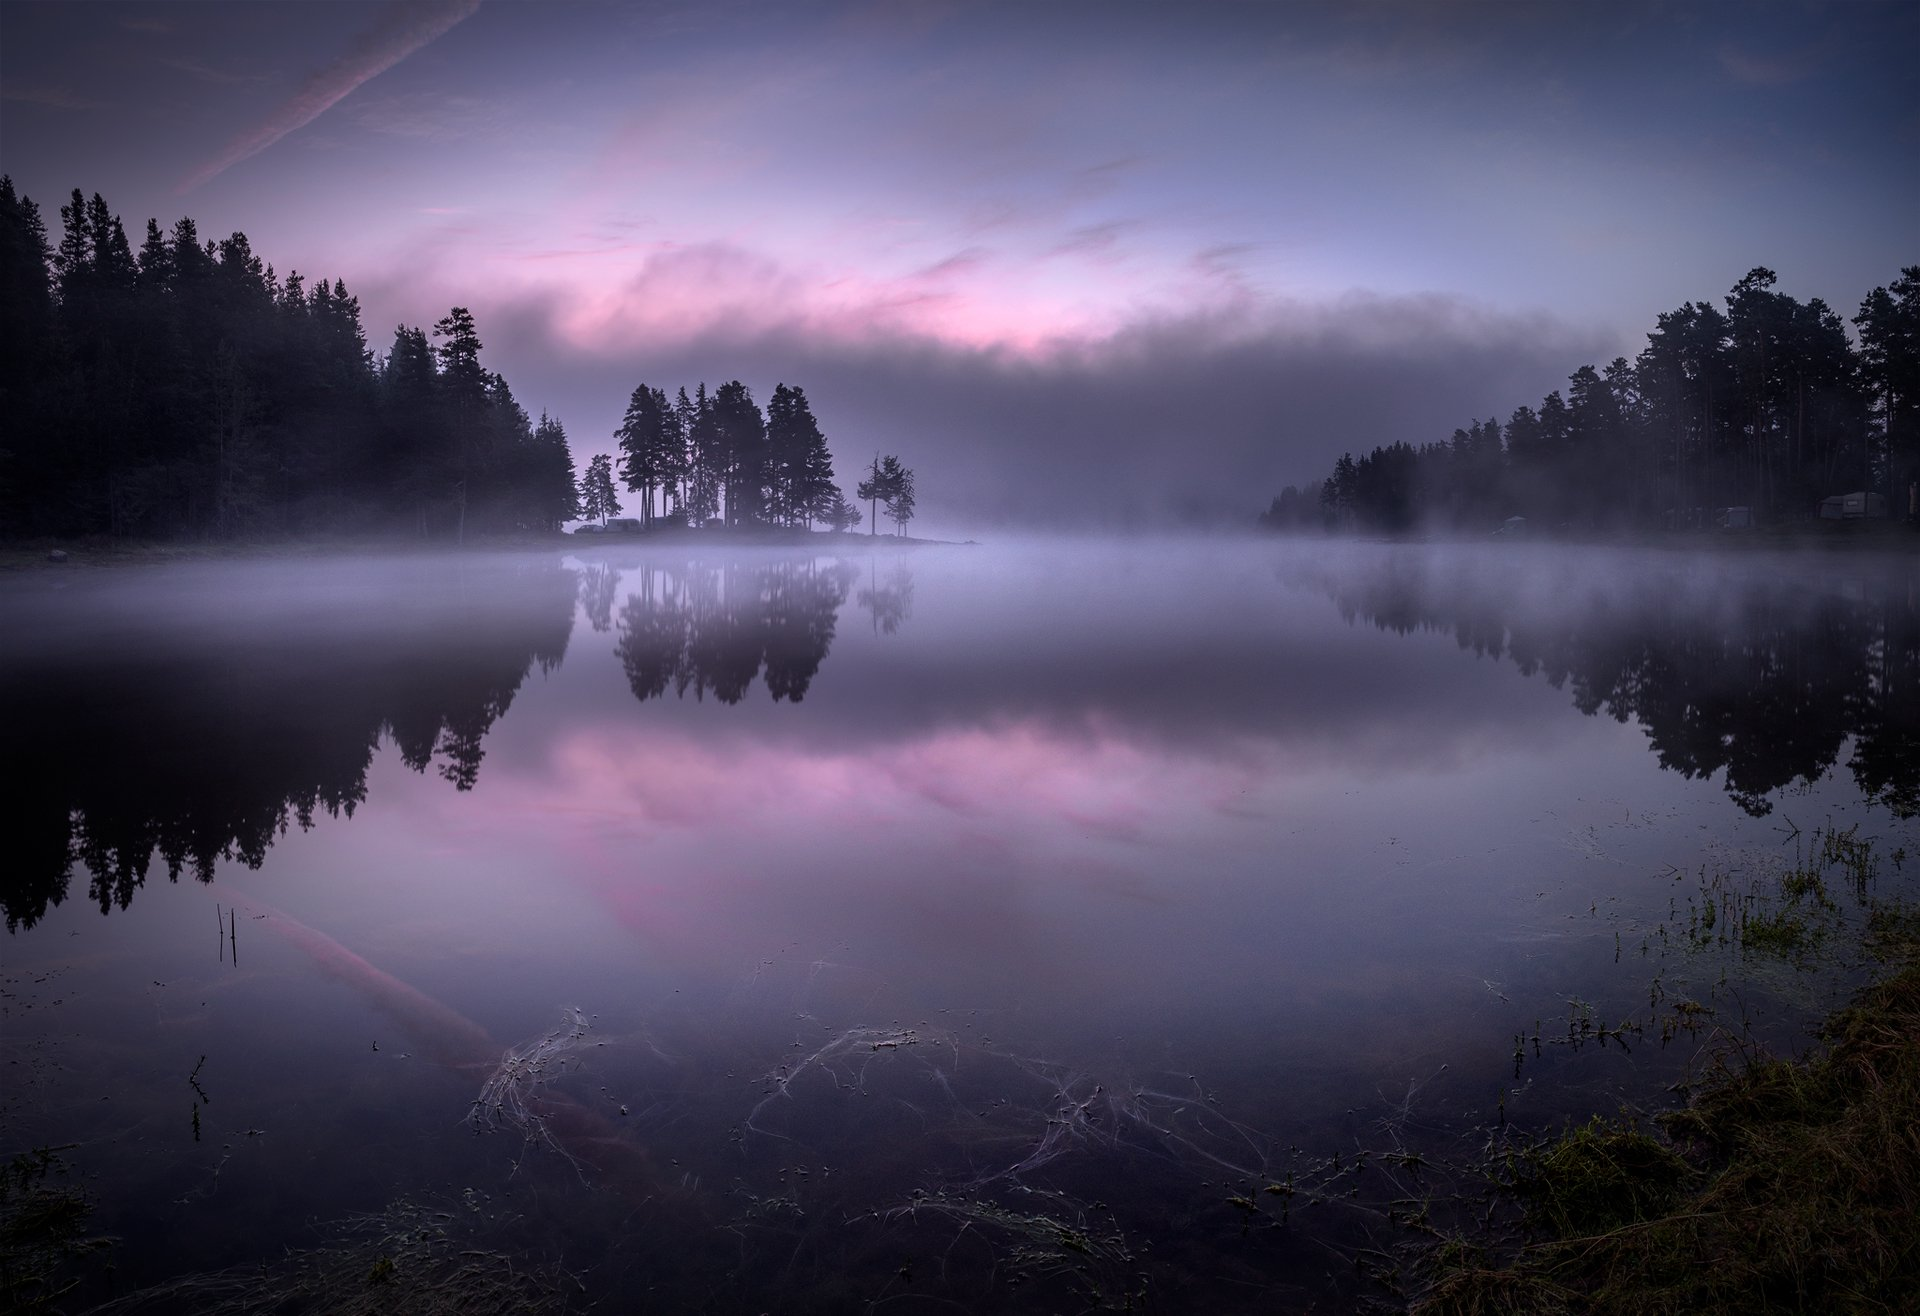 landscape, nature, scenery, lake, wood, mist, misty, fog, foggy, light, sunlight, morning, sunrise, reflections, mountain, rhodopi, bulgaria, туман, озеро, утро, Александров Александър